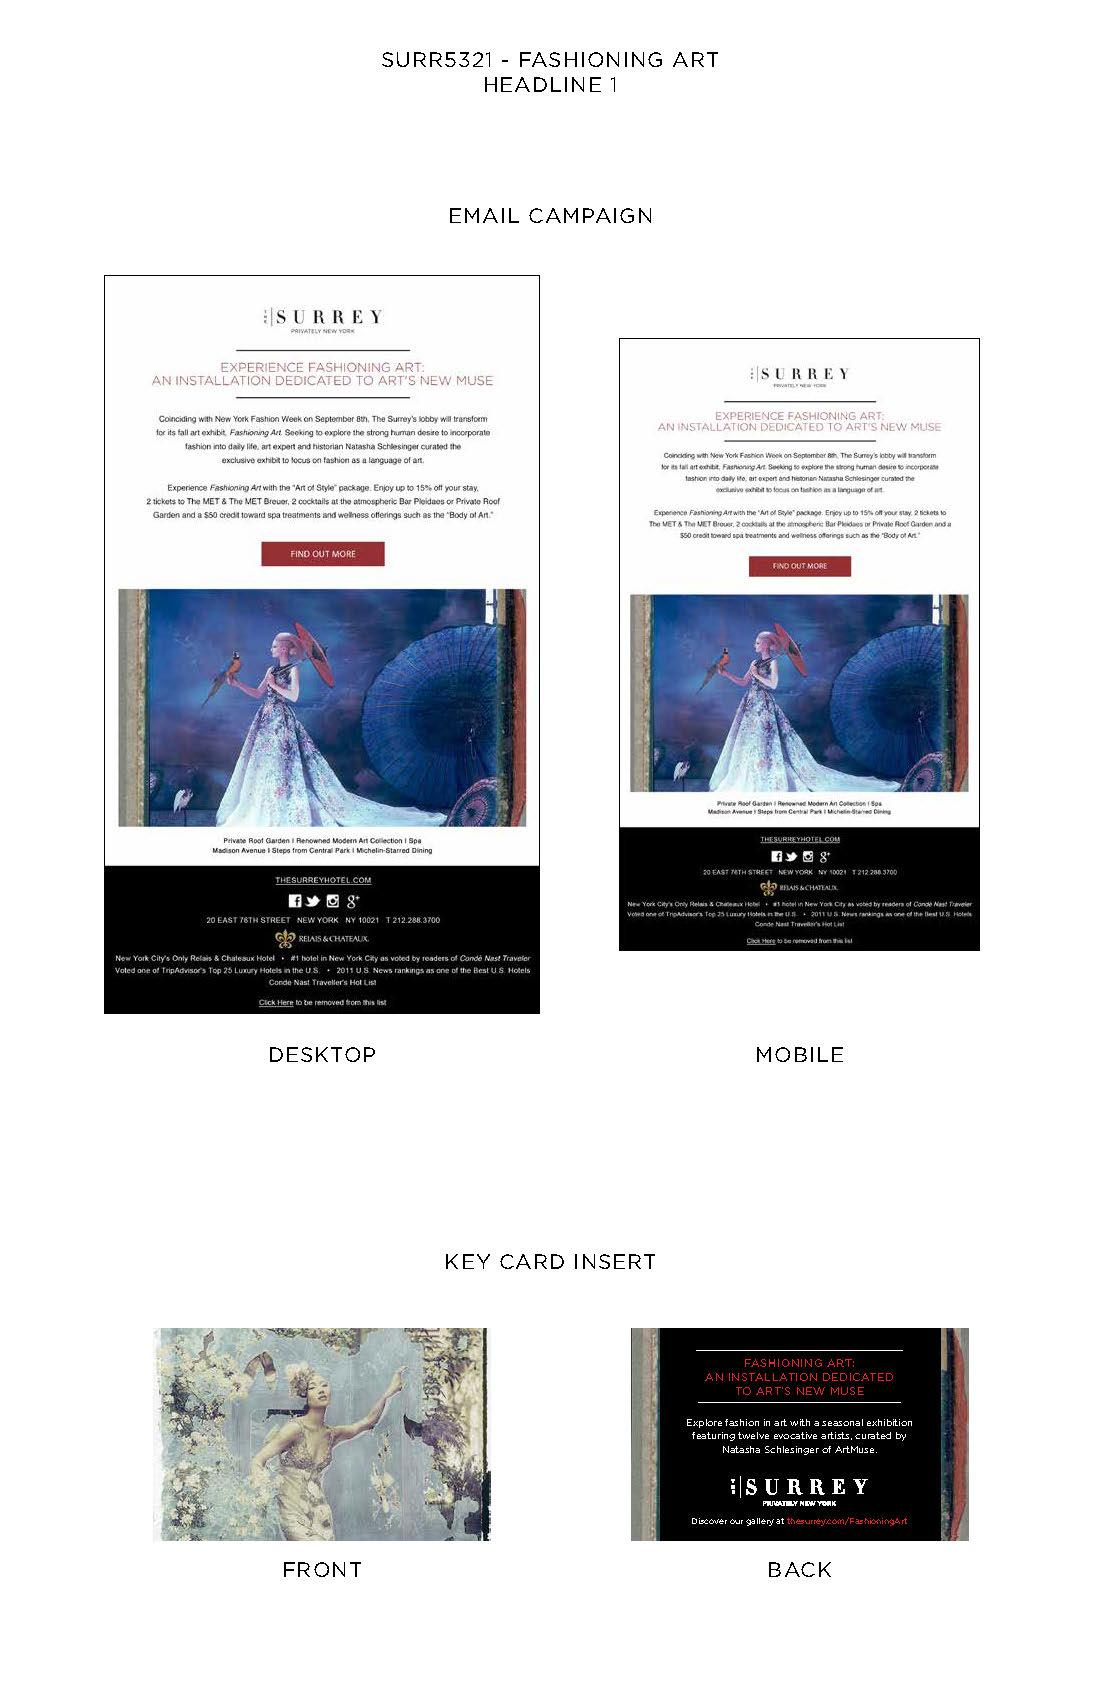 SURR5321-FashioningArt-RD3a_Page_1.jpg